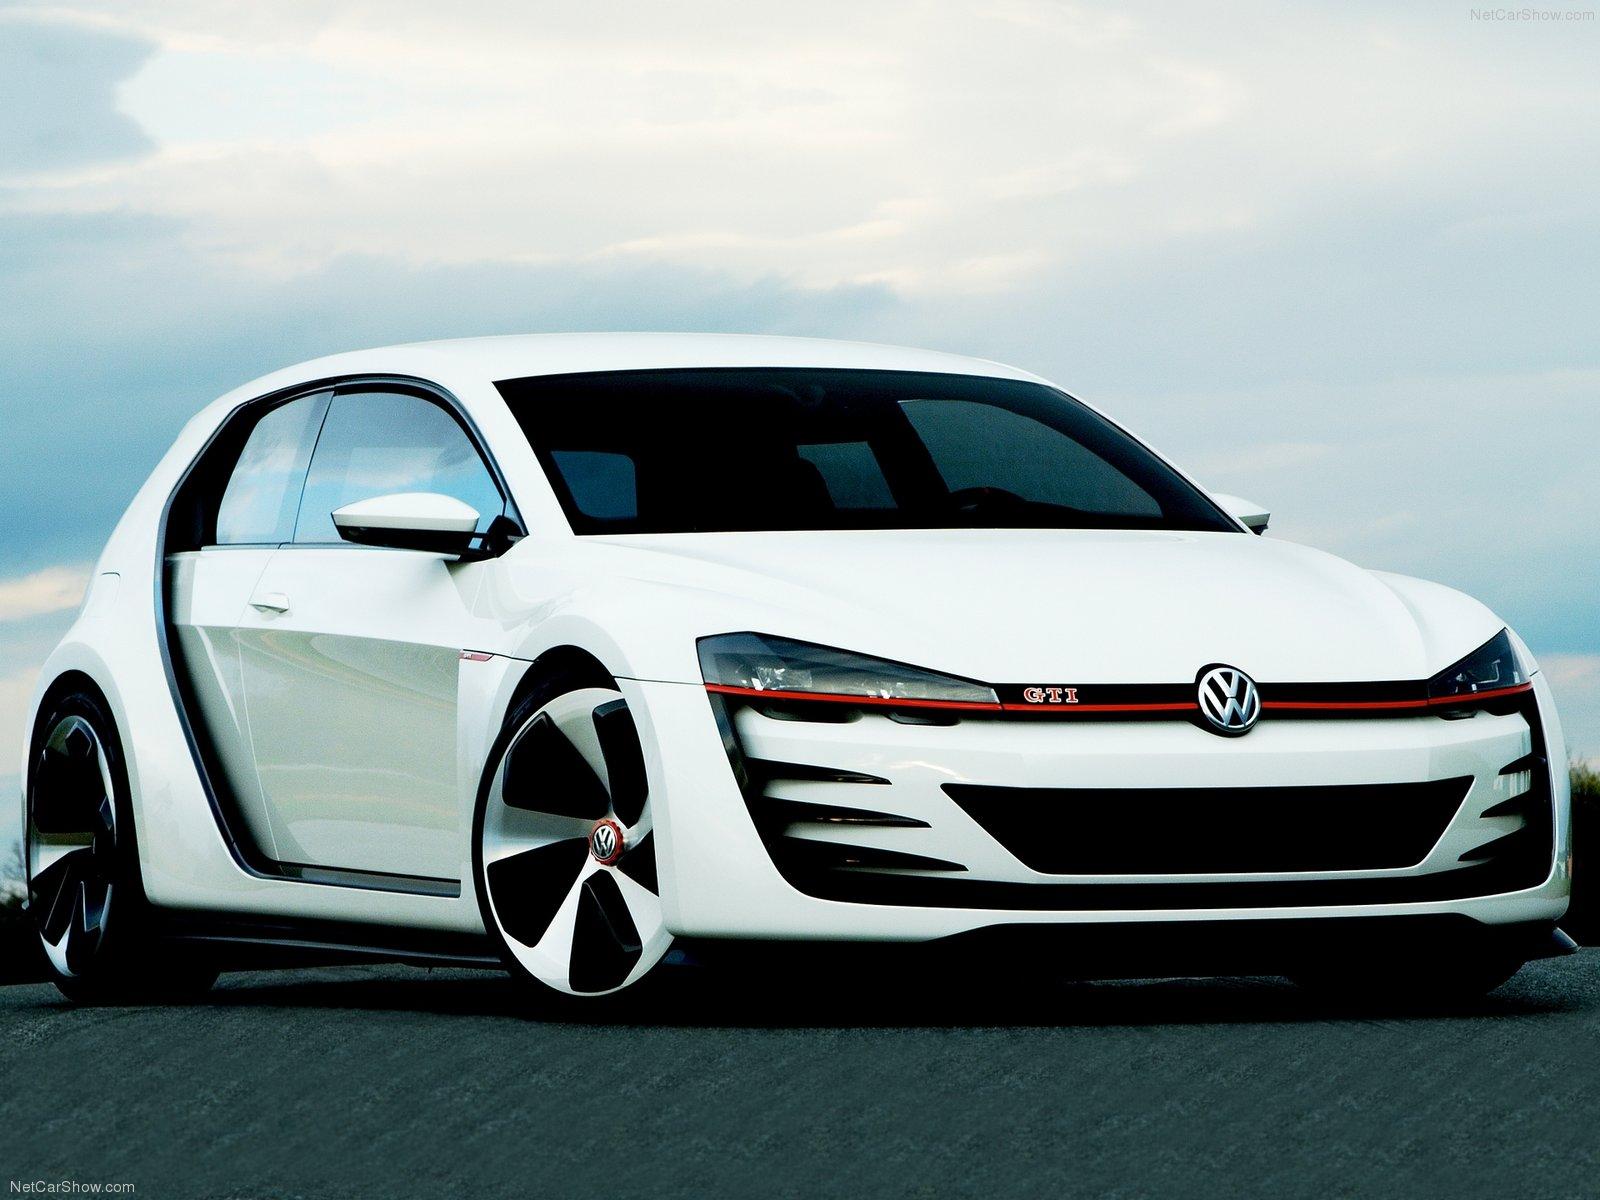 Volkswagen Design Vision GTI Concept 2013 Wallpapers   Vdub Newscom 1600x1200